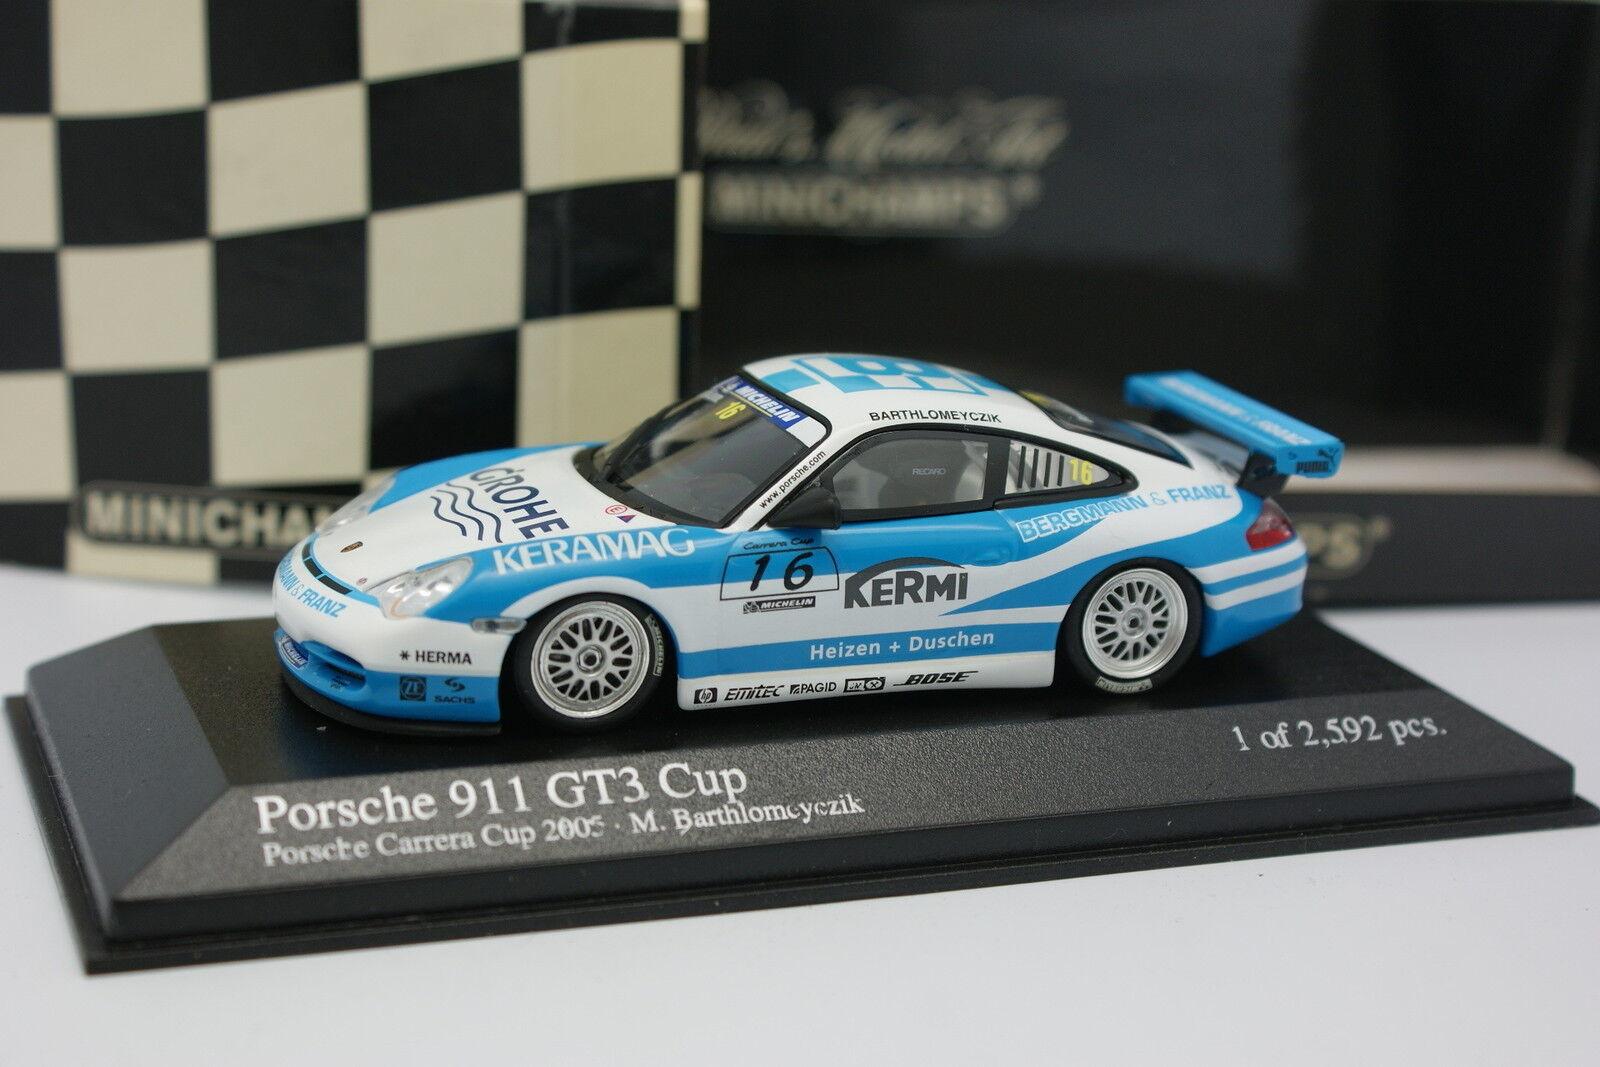 Minichamps 1 43 43 43 - Porsche 911 GT3 Cup Carrera Cup 2005 Nr.16 7b3891